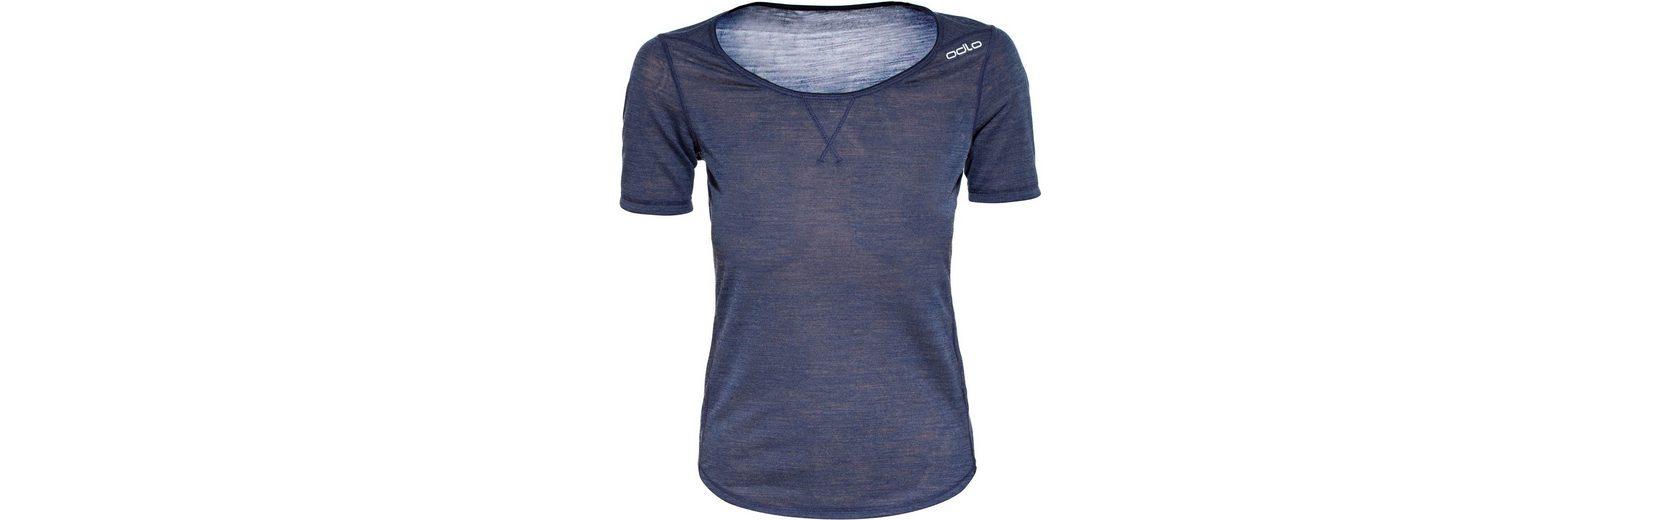 Odlo T-Shirt Revolution TW Light Crew Neck SS Shirt Women Billig Verkauf Zuverlässig S5BpvjbU